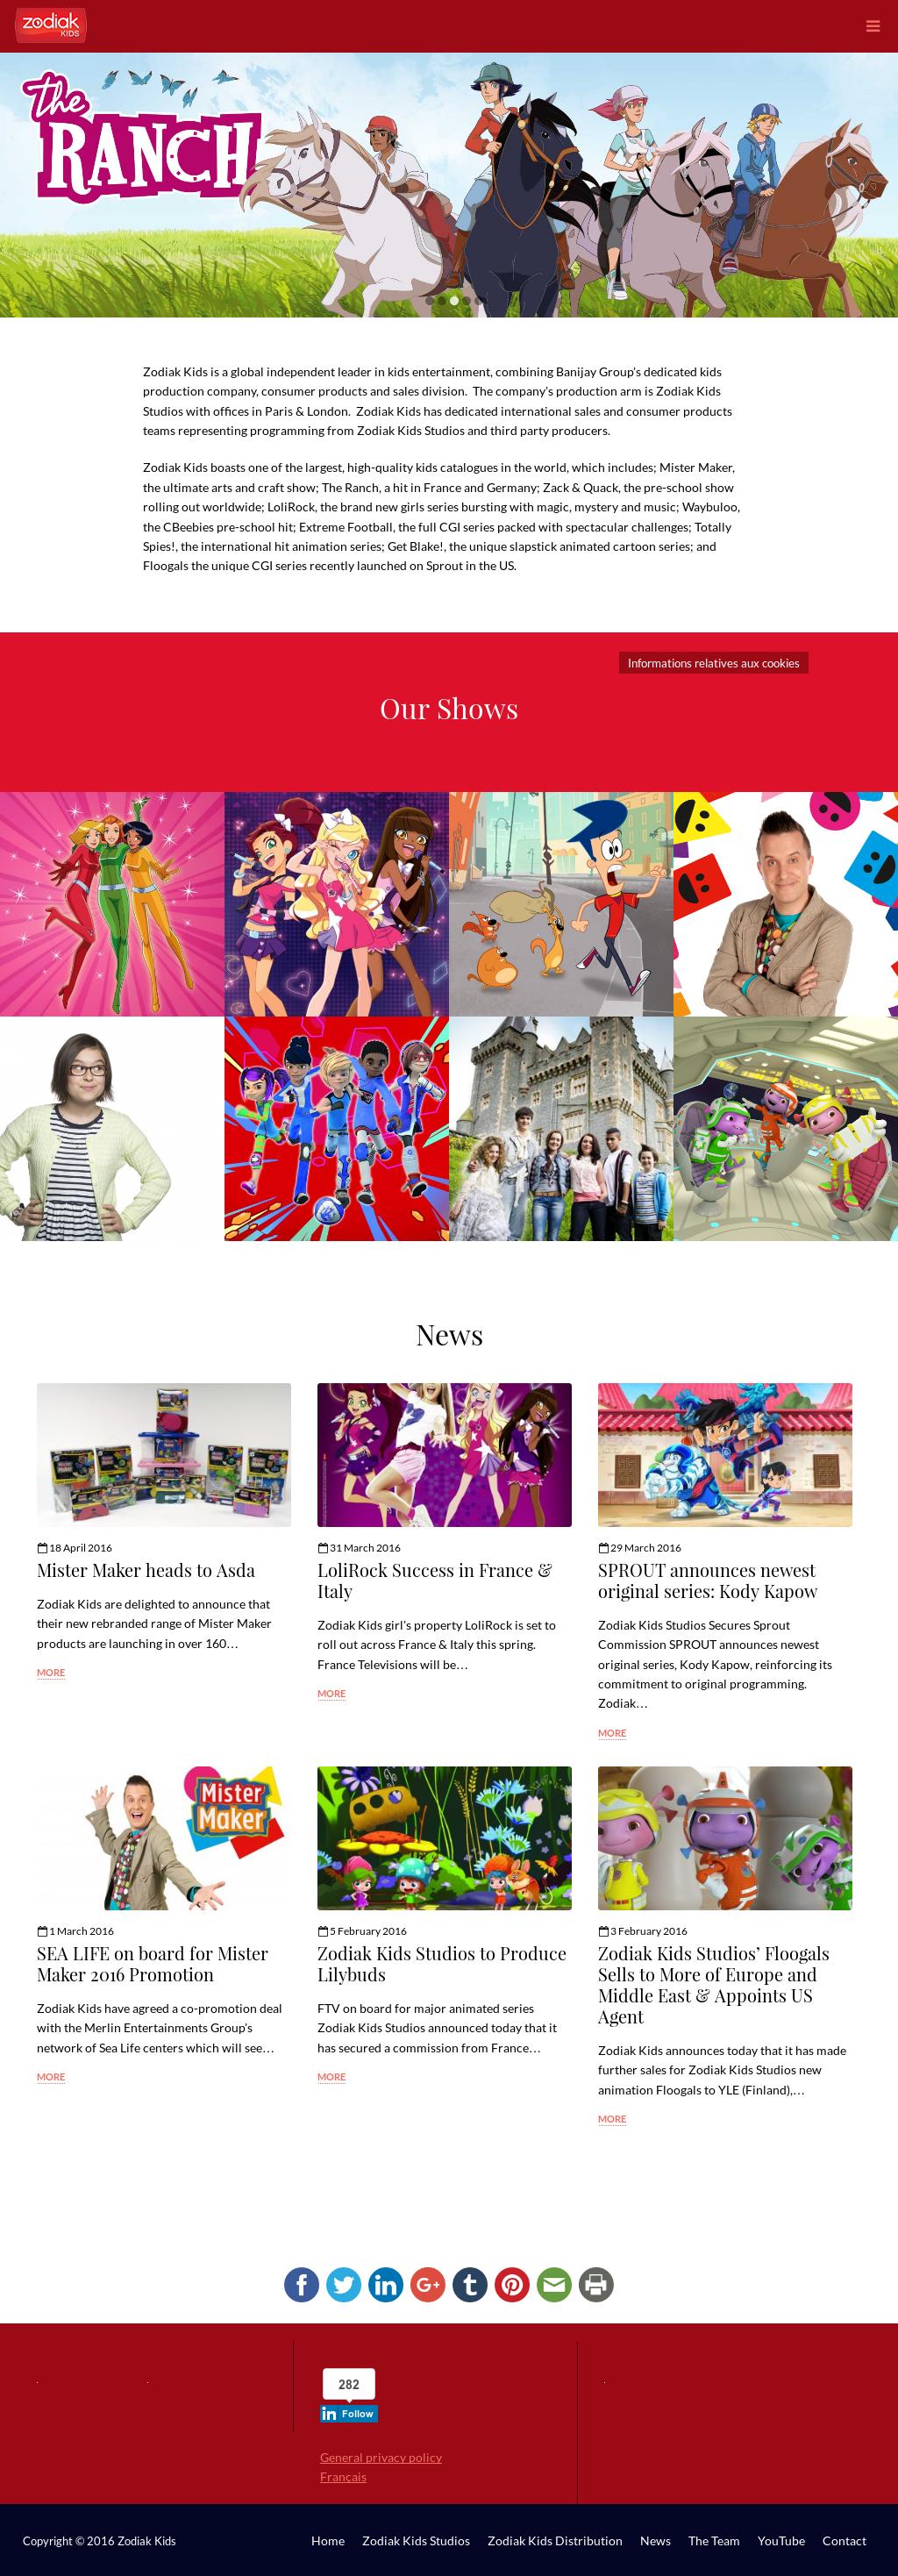 Zodiak Kids Competitors, Revenue and Employees - Owler Company Profile